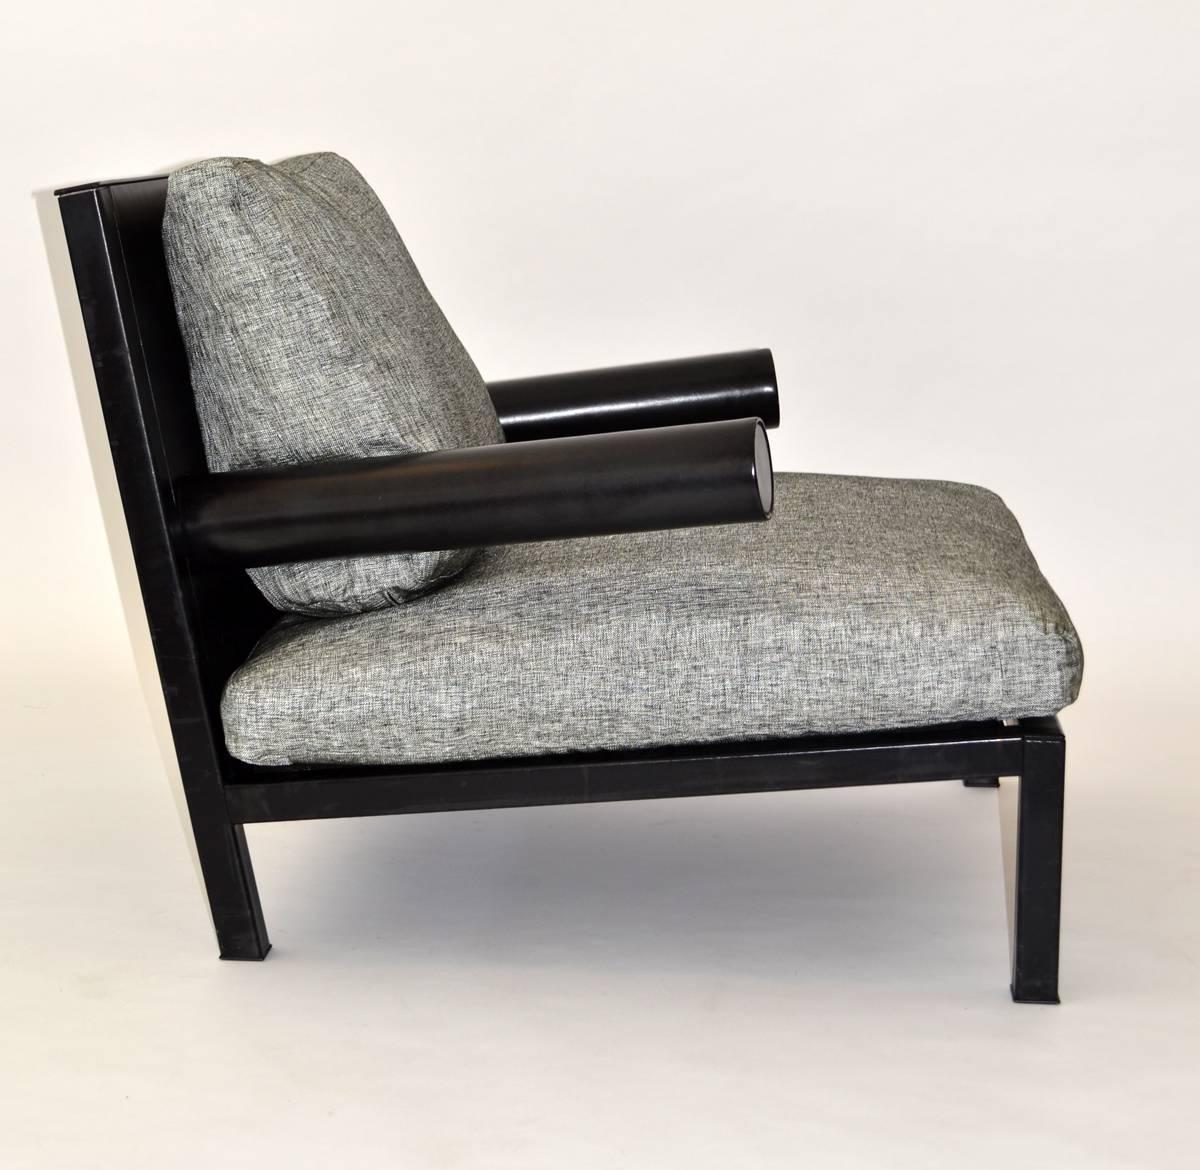 39 Baisity 39 Lounge Chair By Antonio Citterio For B B Italia